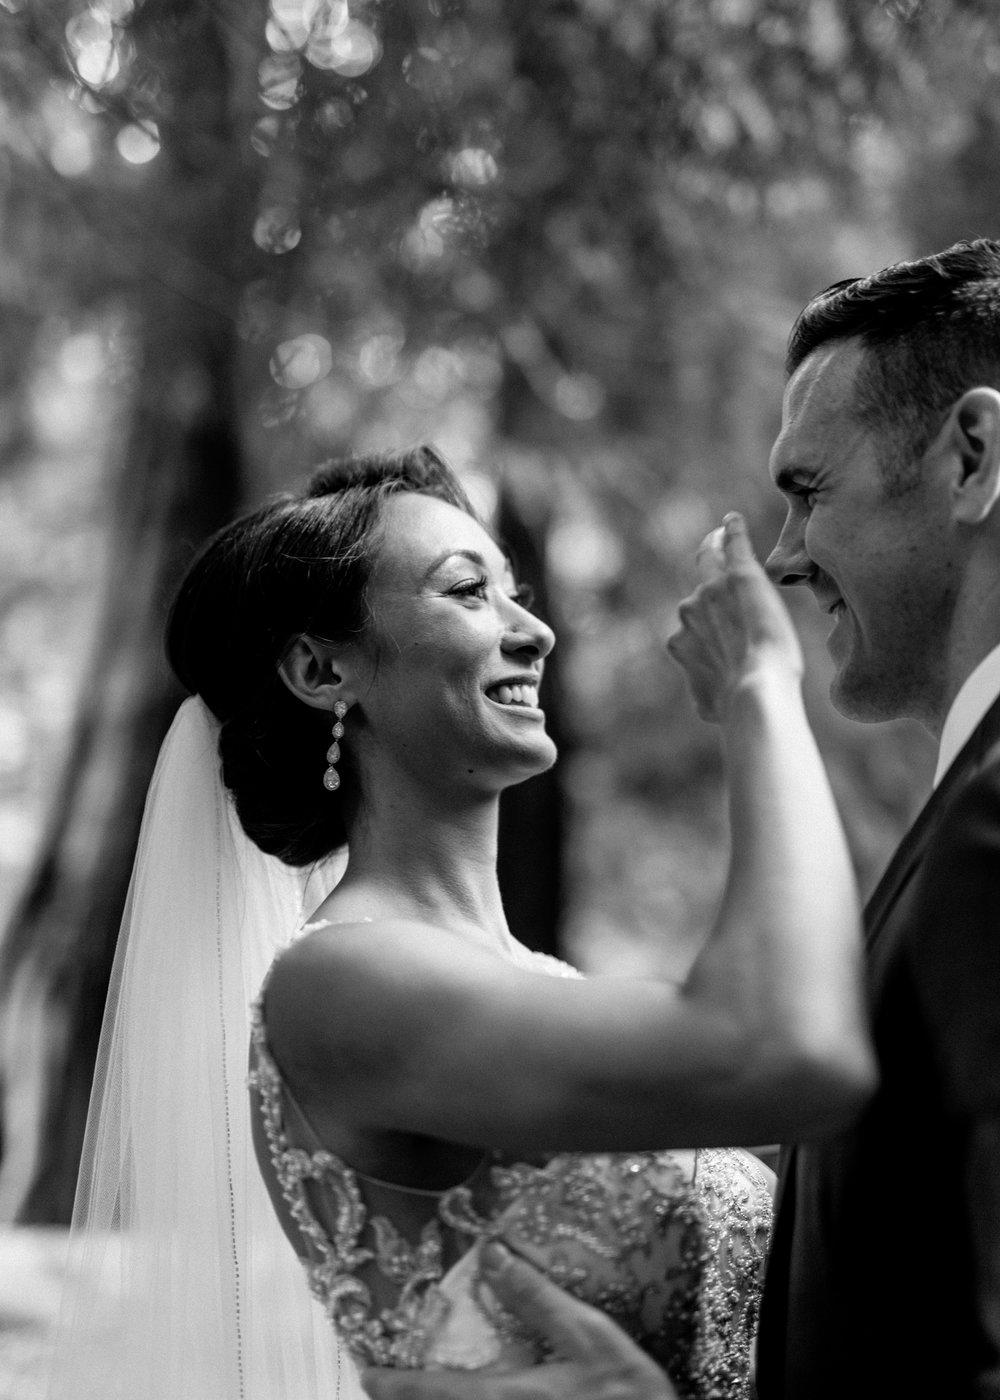 herafilms_wedding_jayne_connor_hera_selects-51.jpg